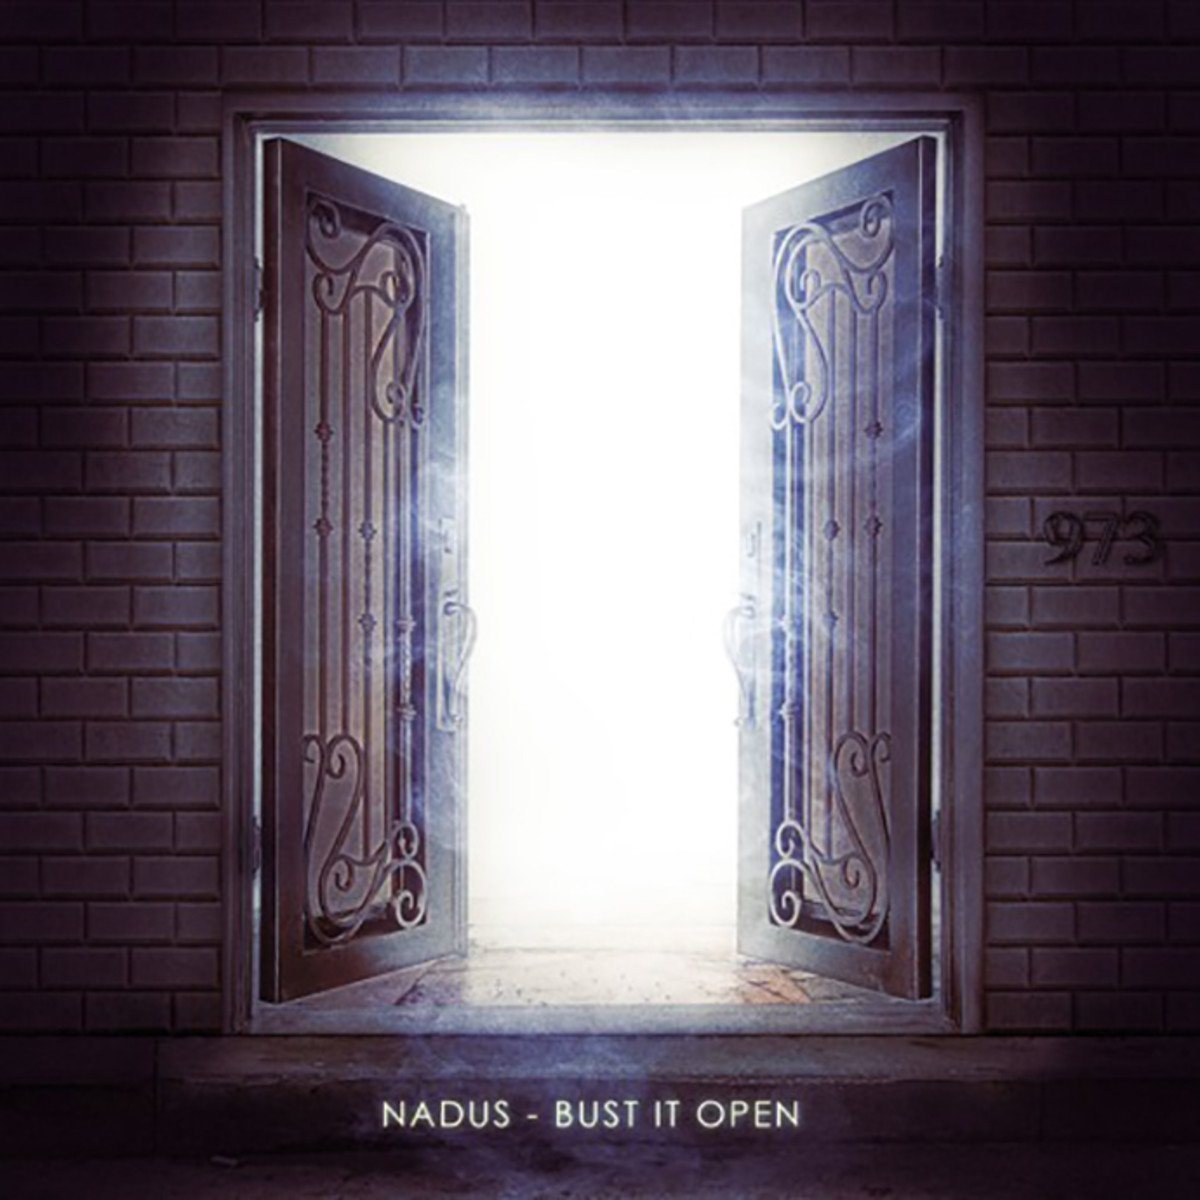 Nadus Bust It Open